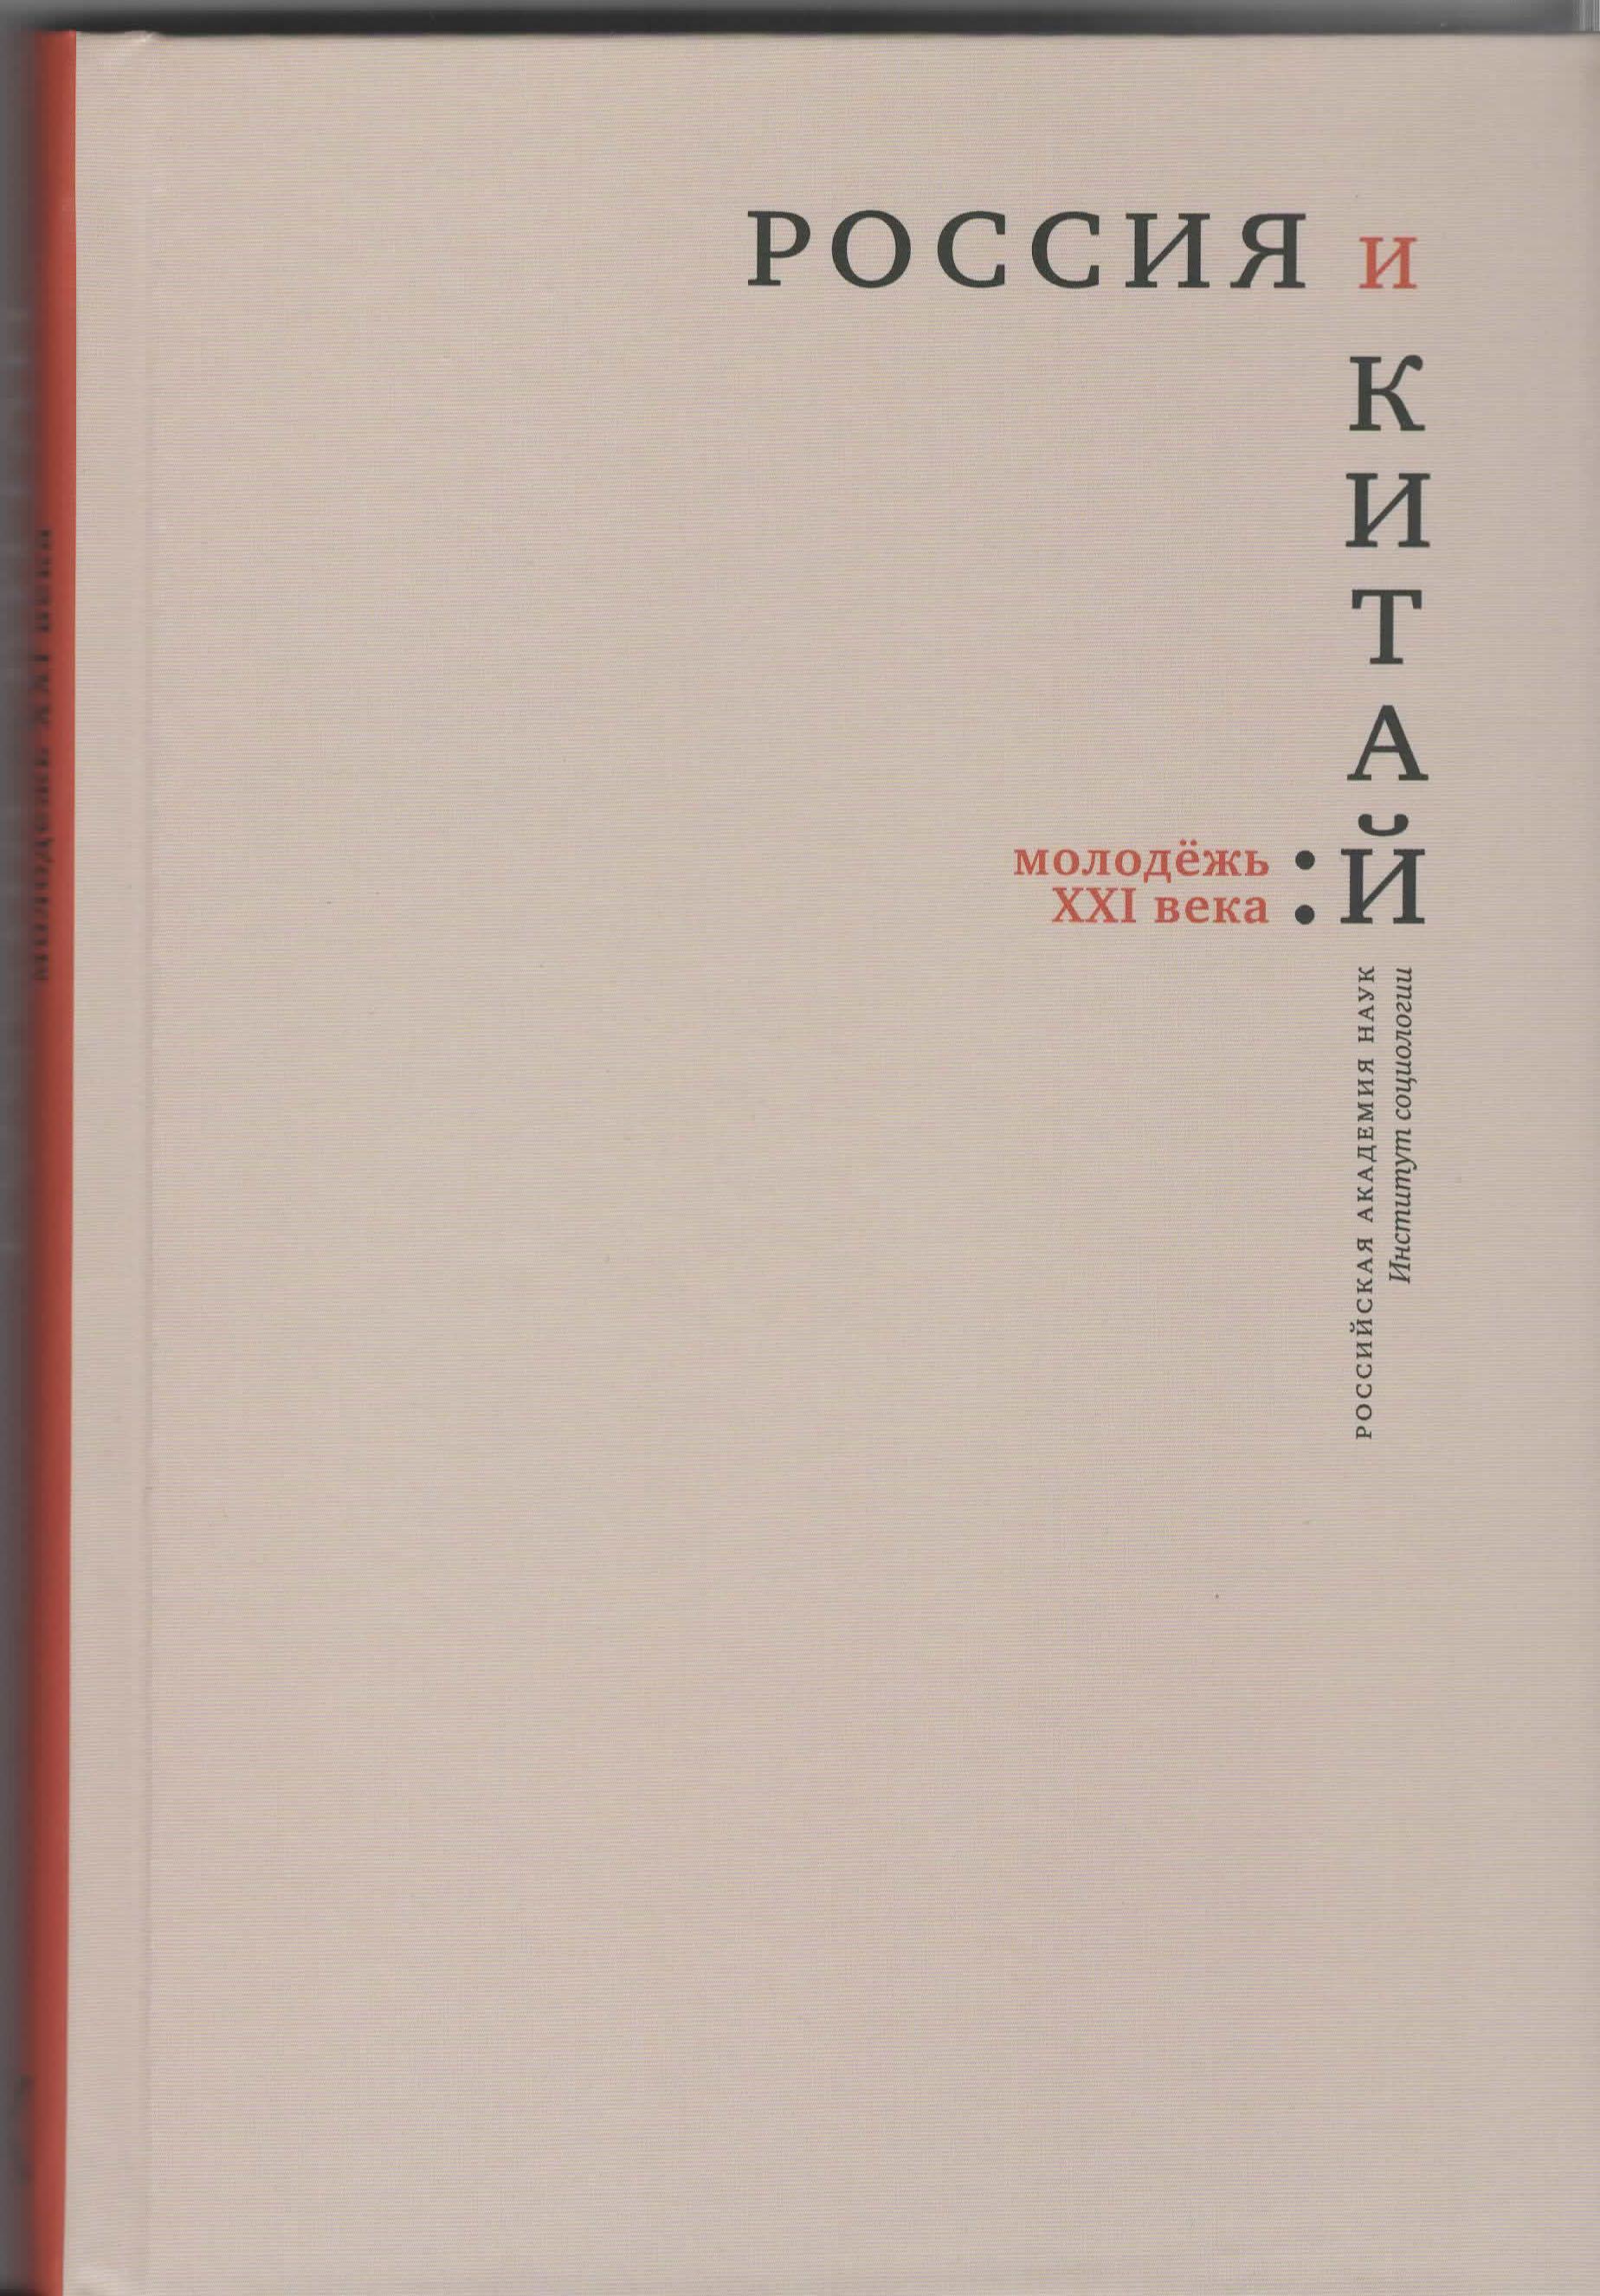 Россия и Китай: молодежь XXI века